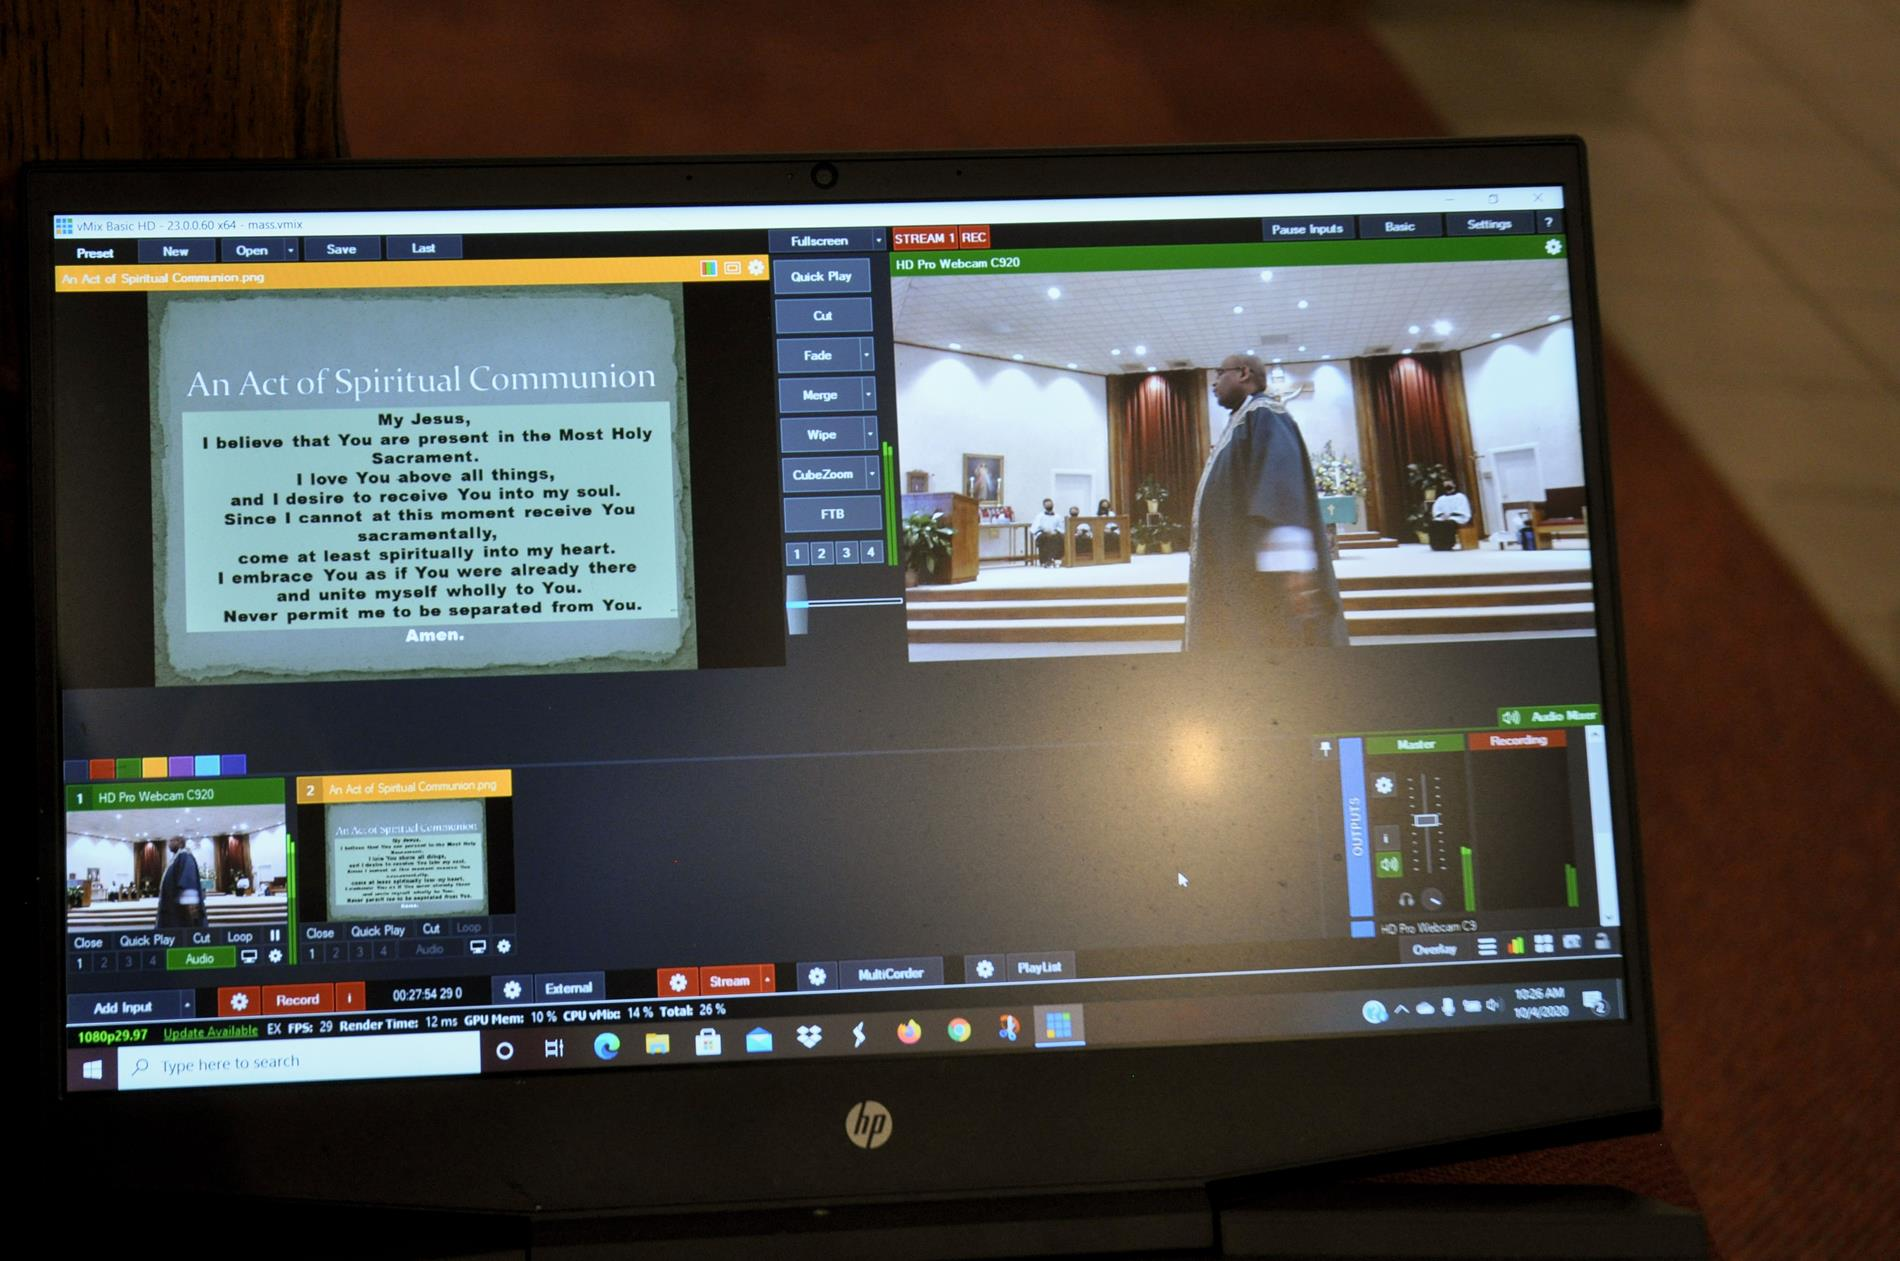 Website livestream software in action